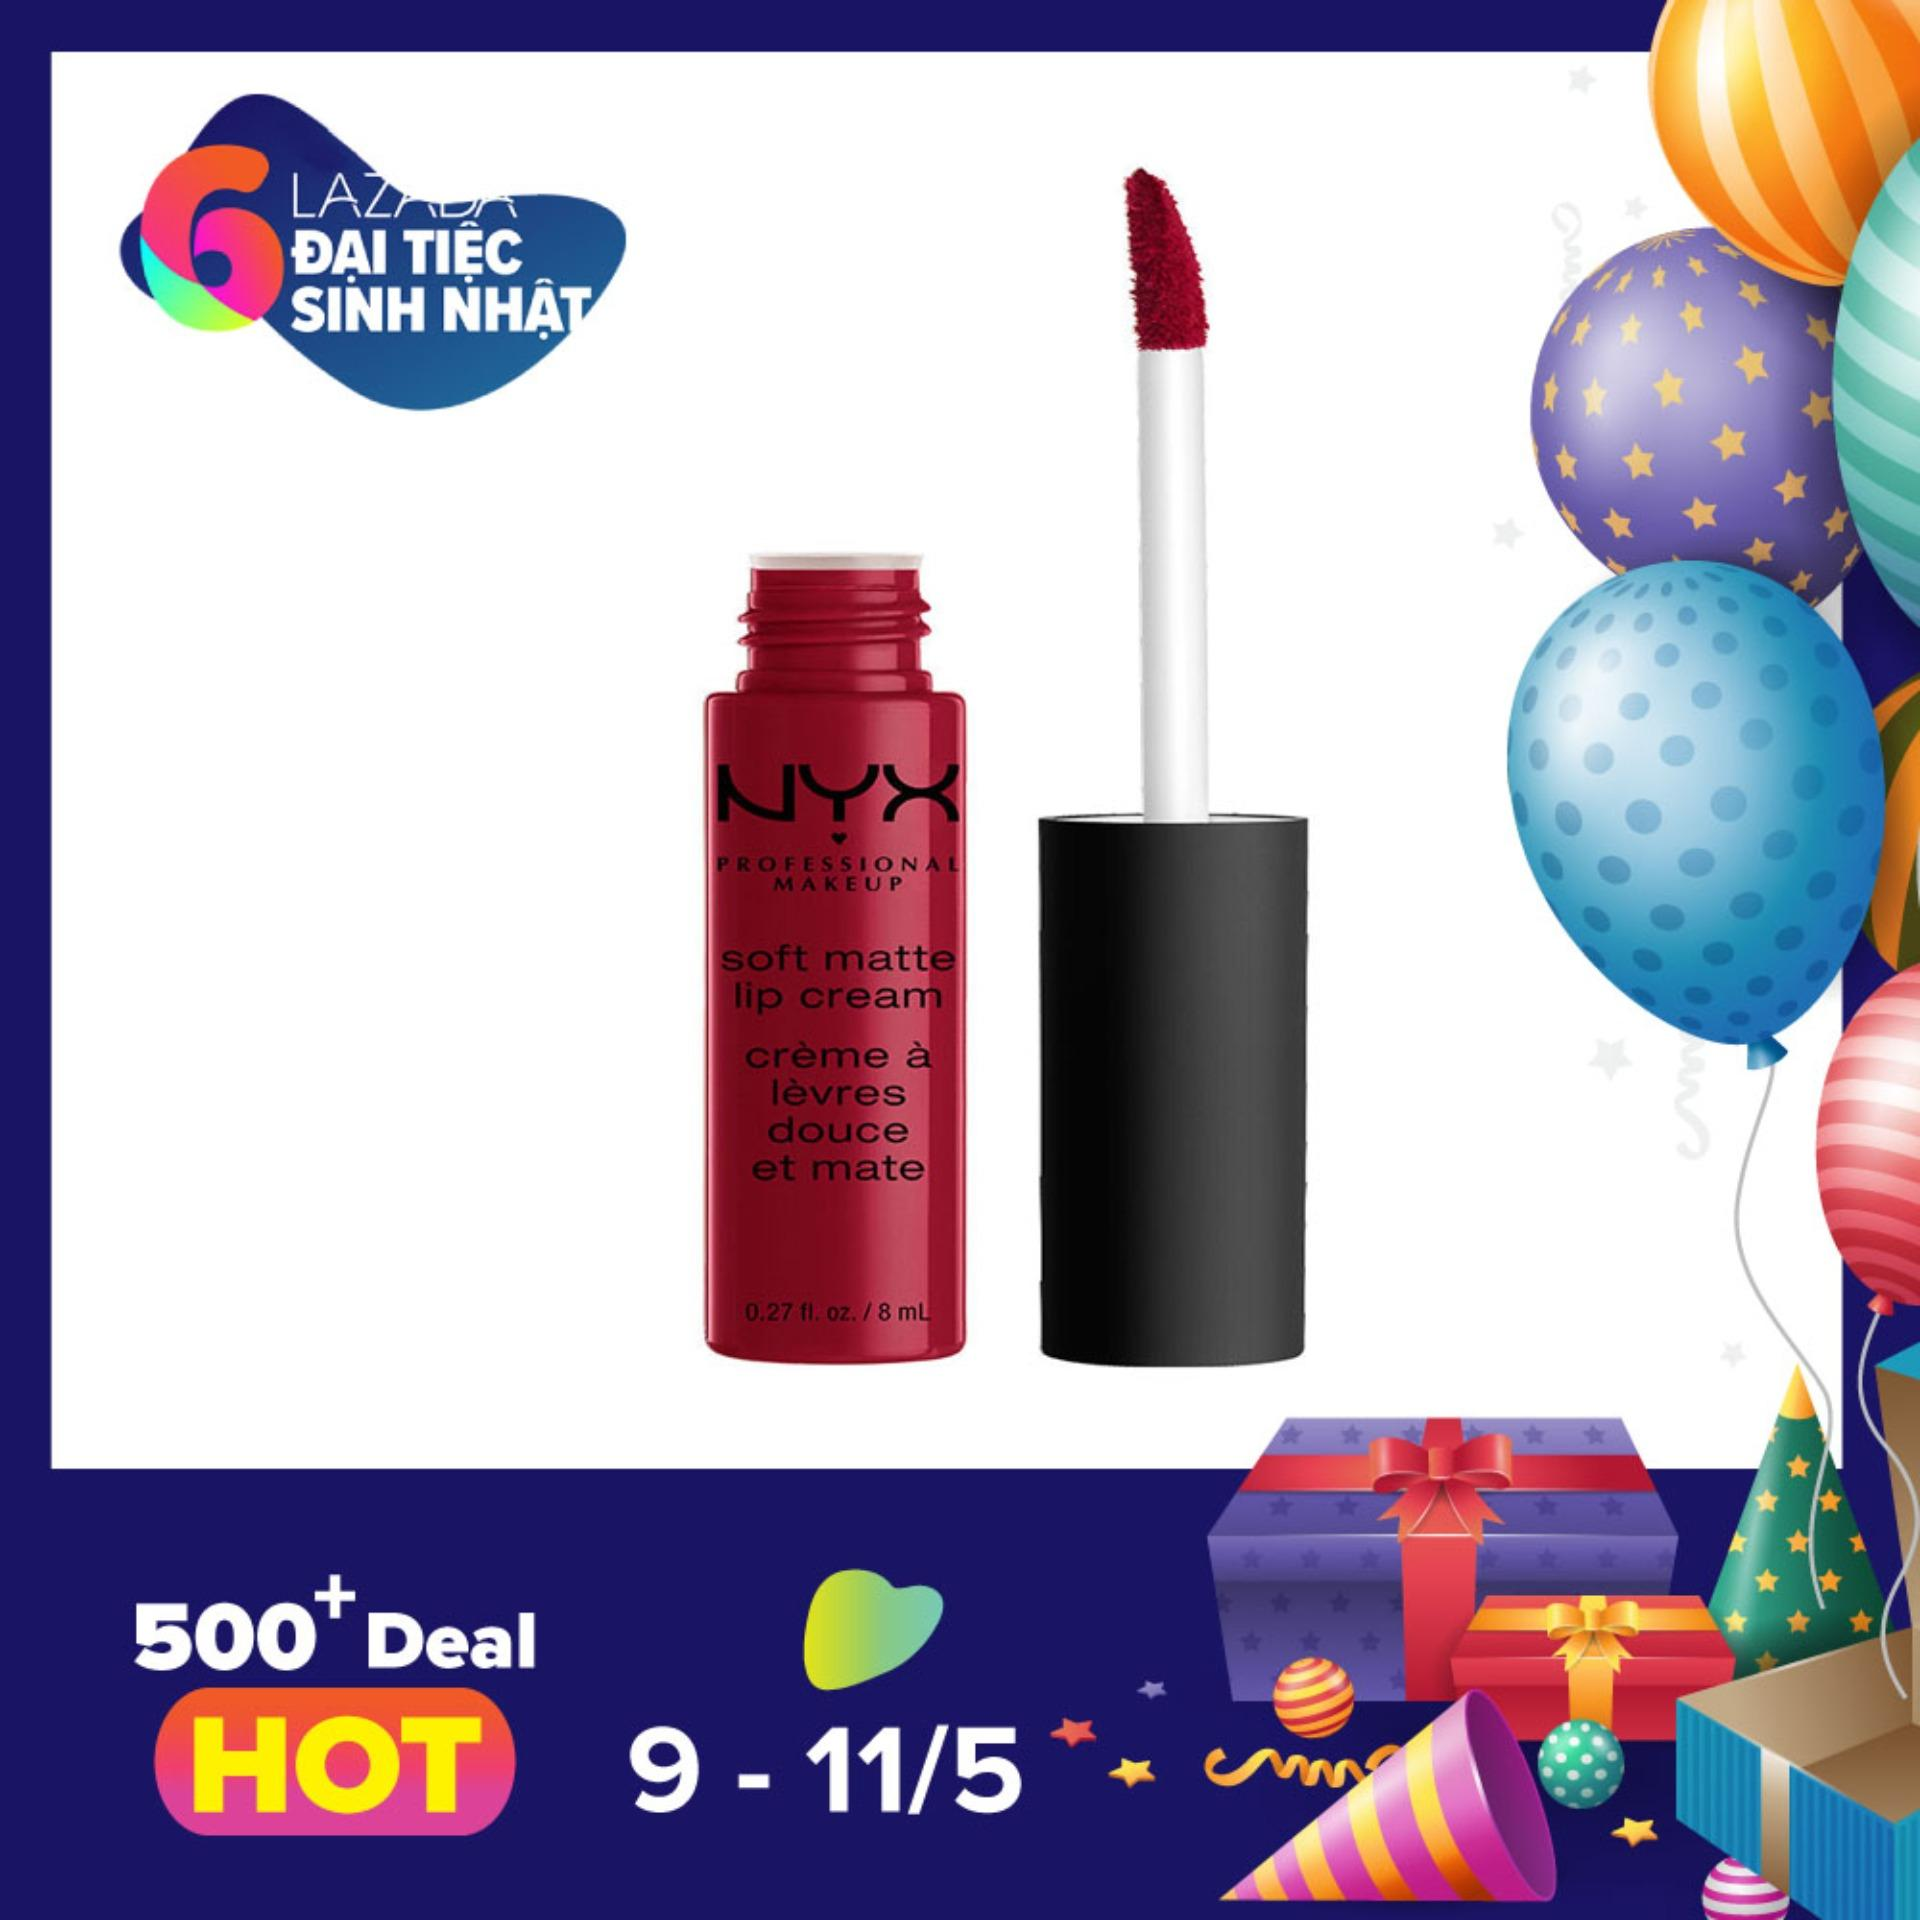 Chiết Khấu Son Kem Nyx Professional Makeup Soft Matte Lip Cream Smlc10 Monte Carlo Việt Nam